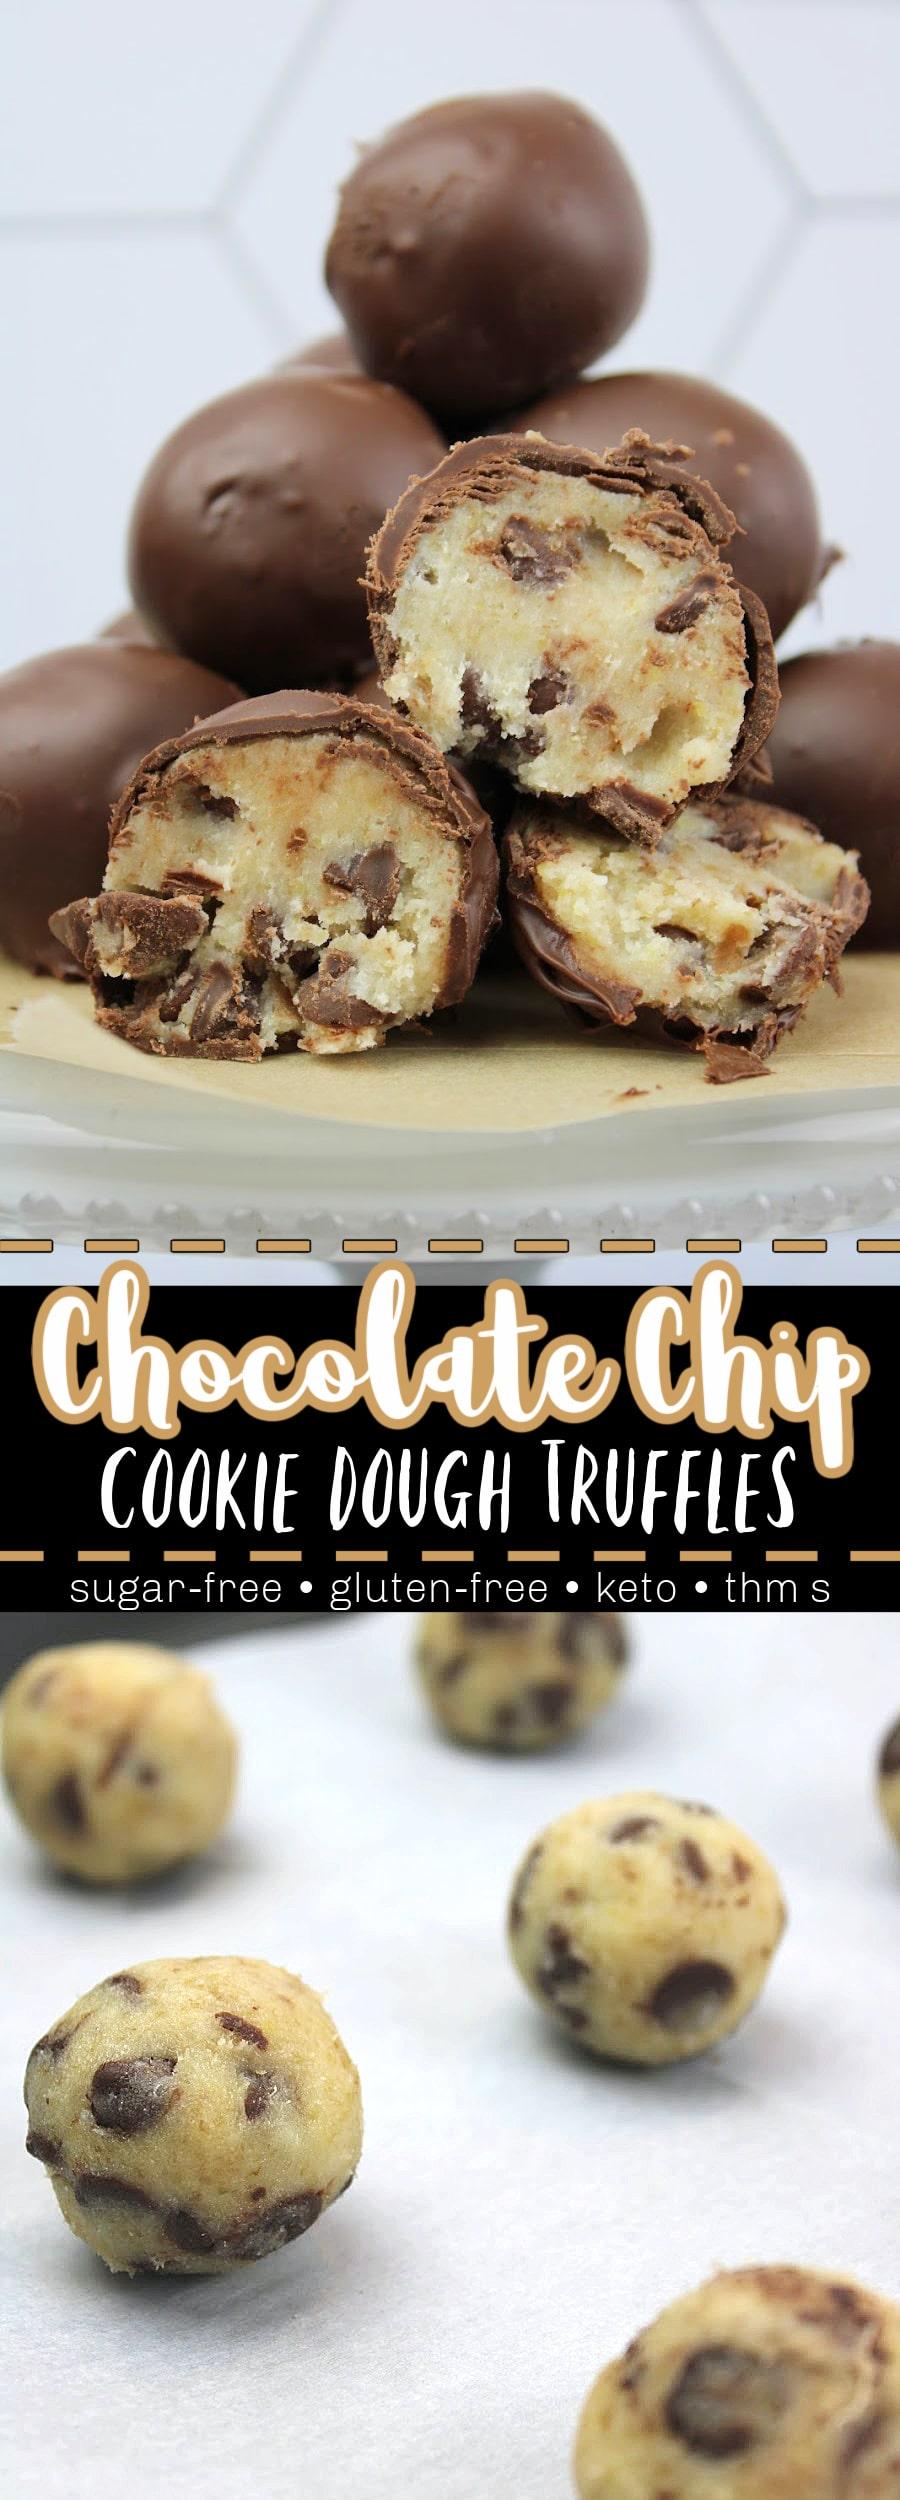 Chocolate Chip Cookie Dough Truffles (Sugar-Free) Pin Image